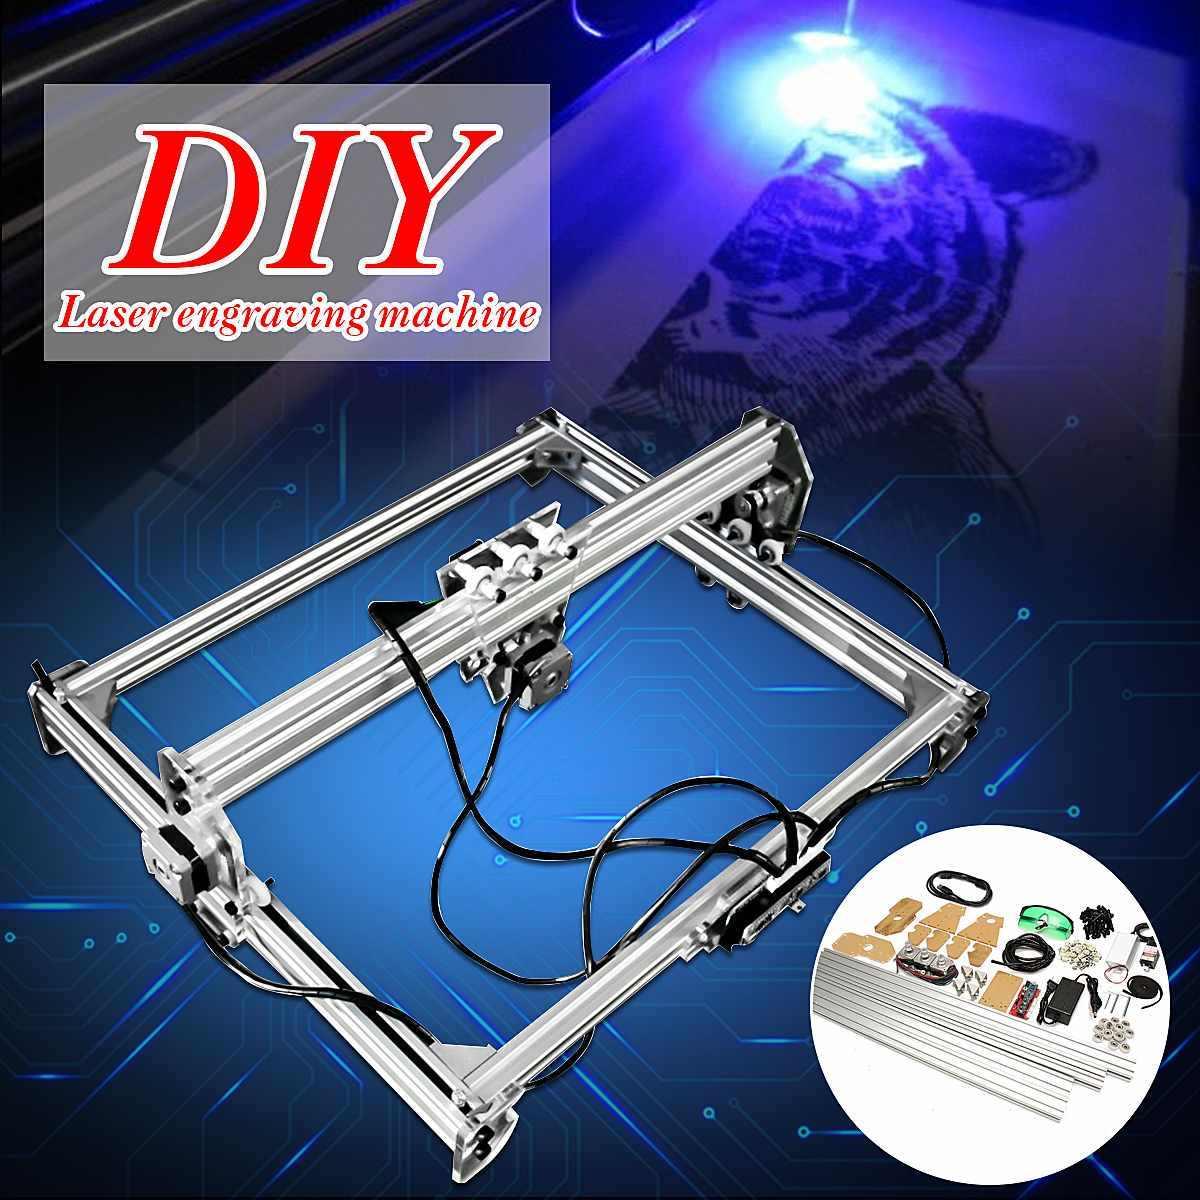 50*65cm 15W CNC Laser Graveur Graveermachine voor Metaal/Hout Router/DIY Cutter 2 axis Graveur Desktop Cutter + Laser